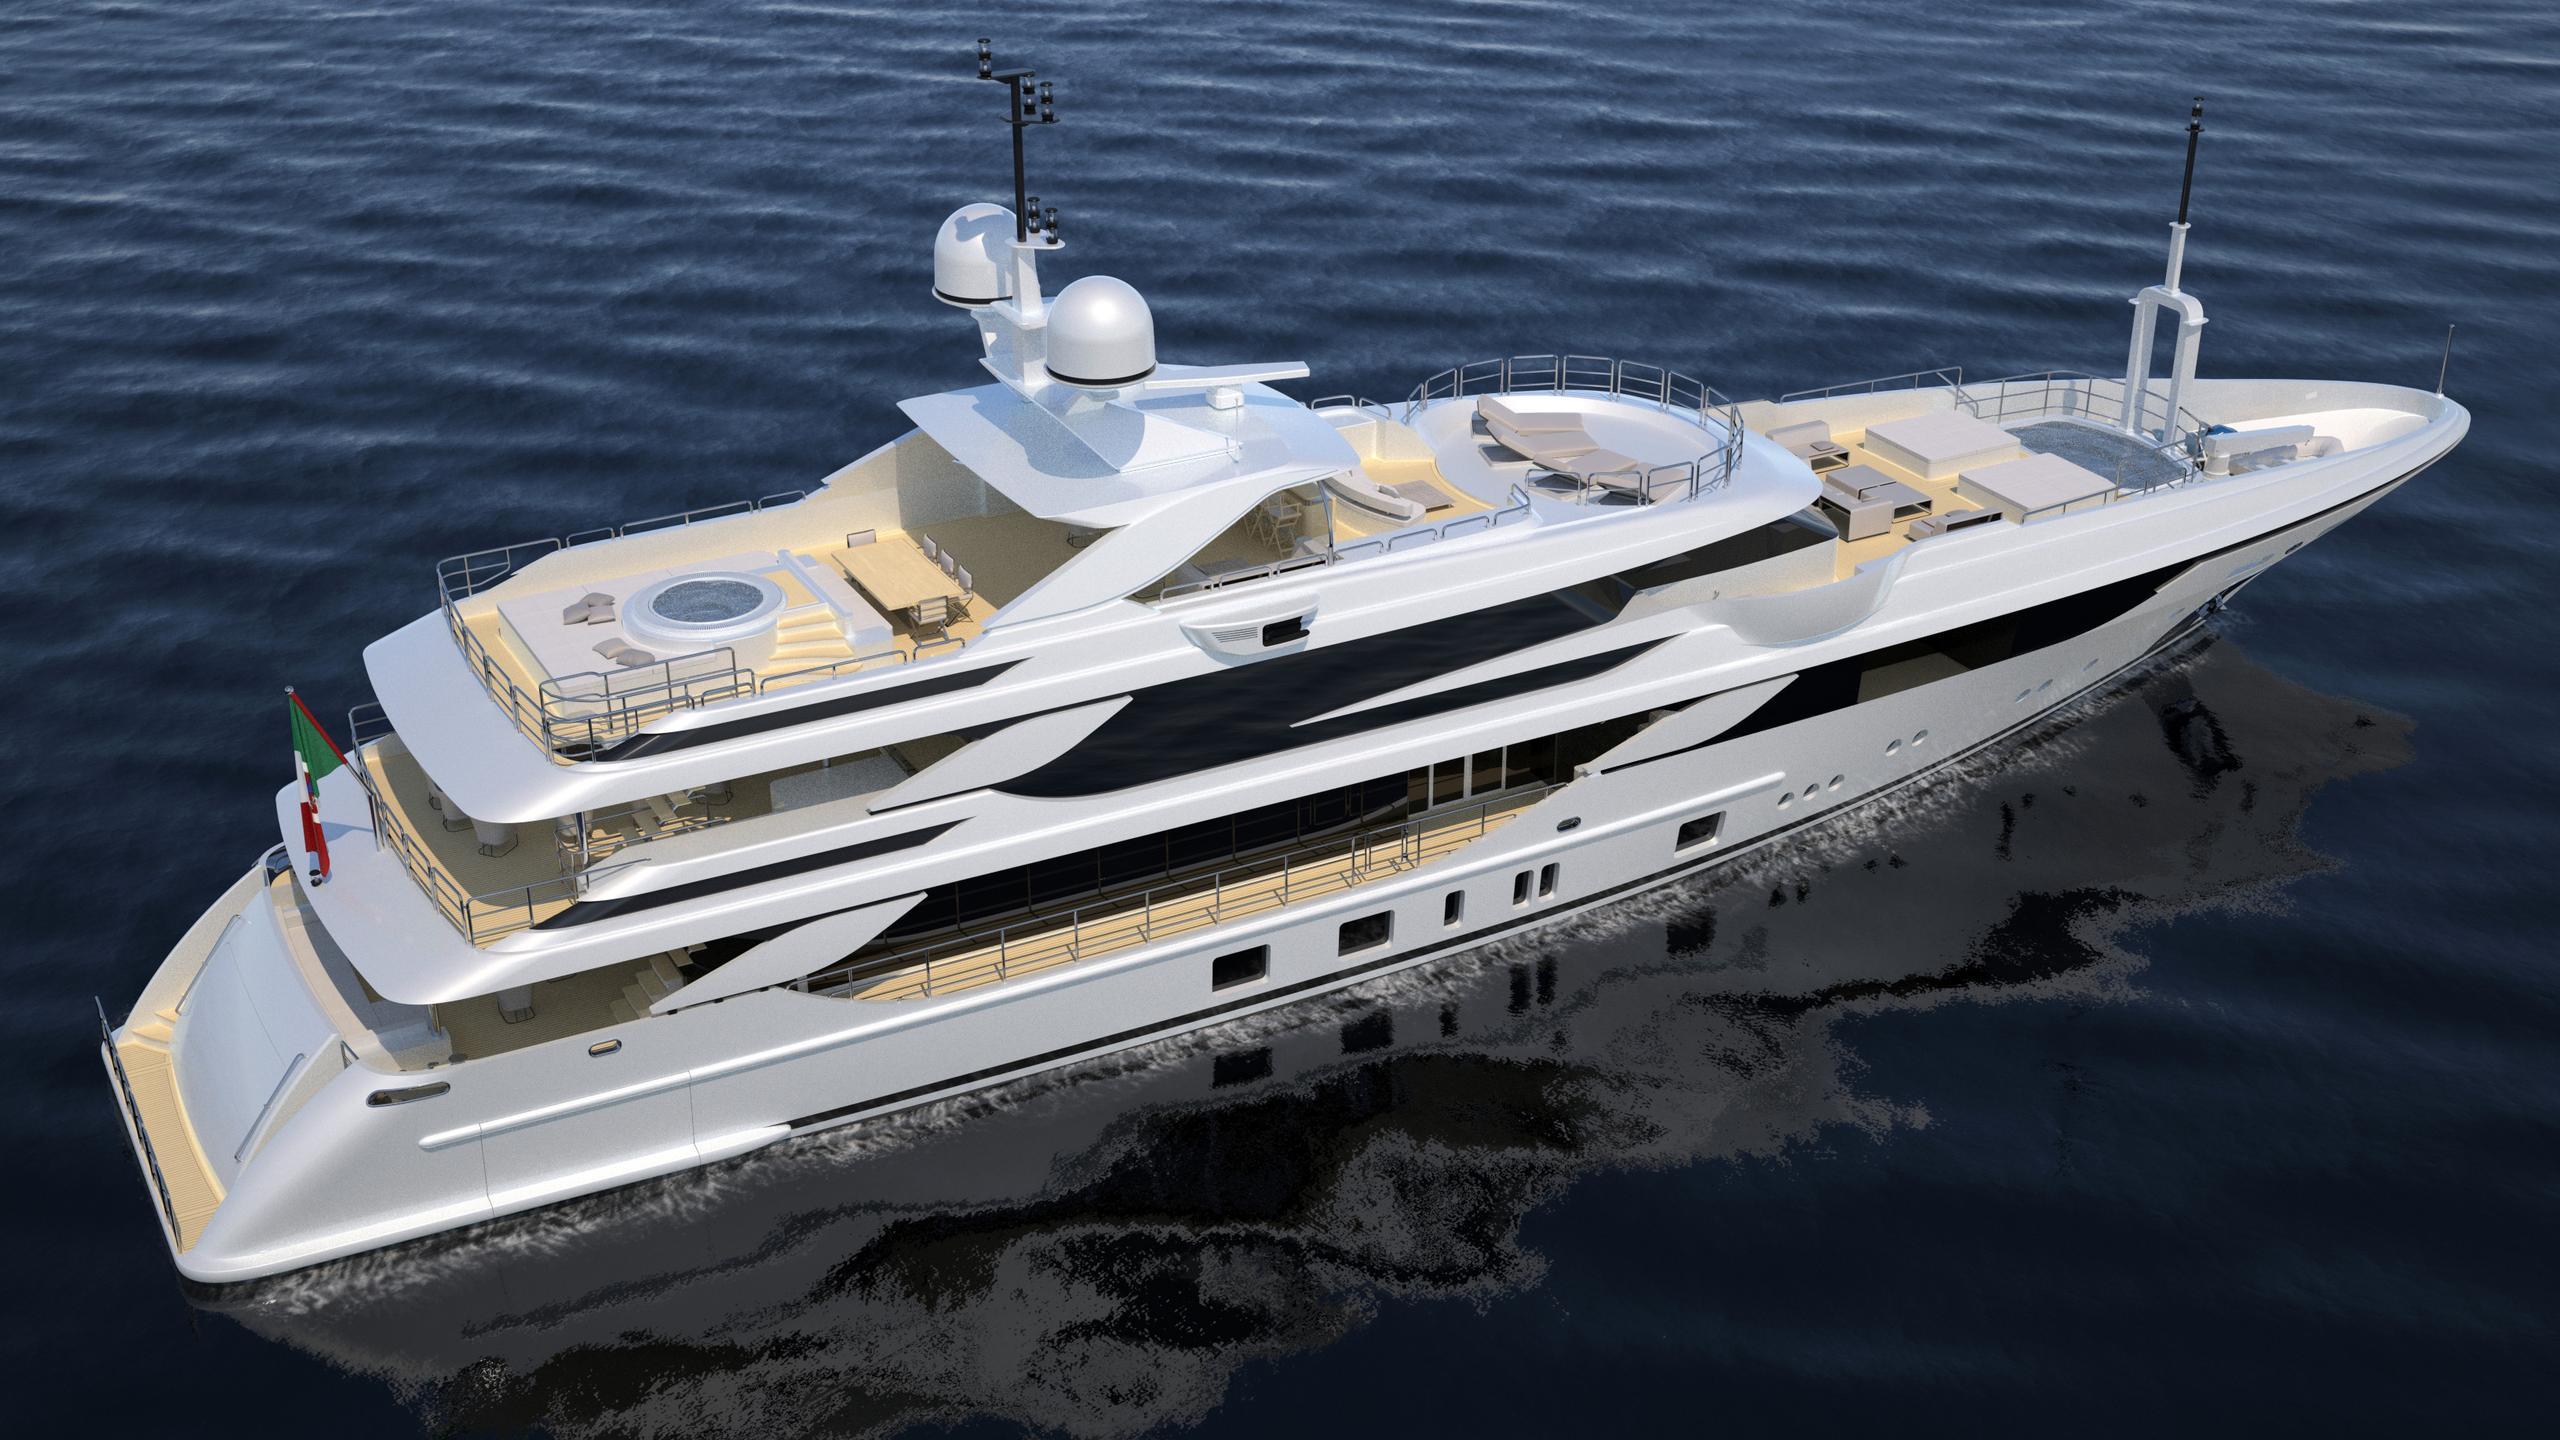 benetti-fb802-breeze-yacht-exterior-rendering